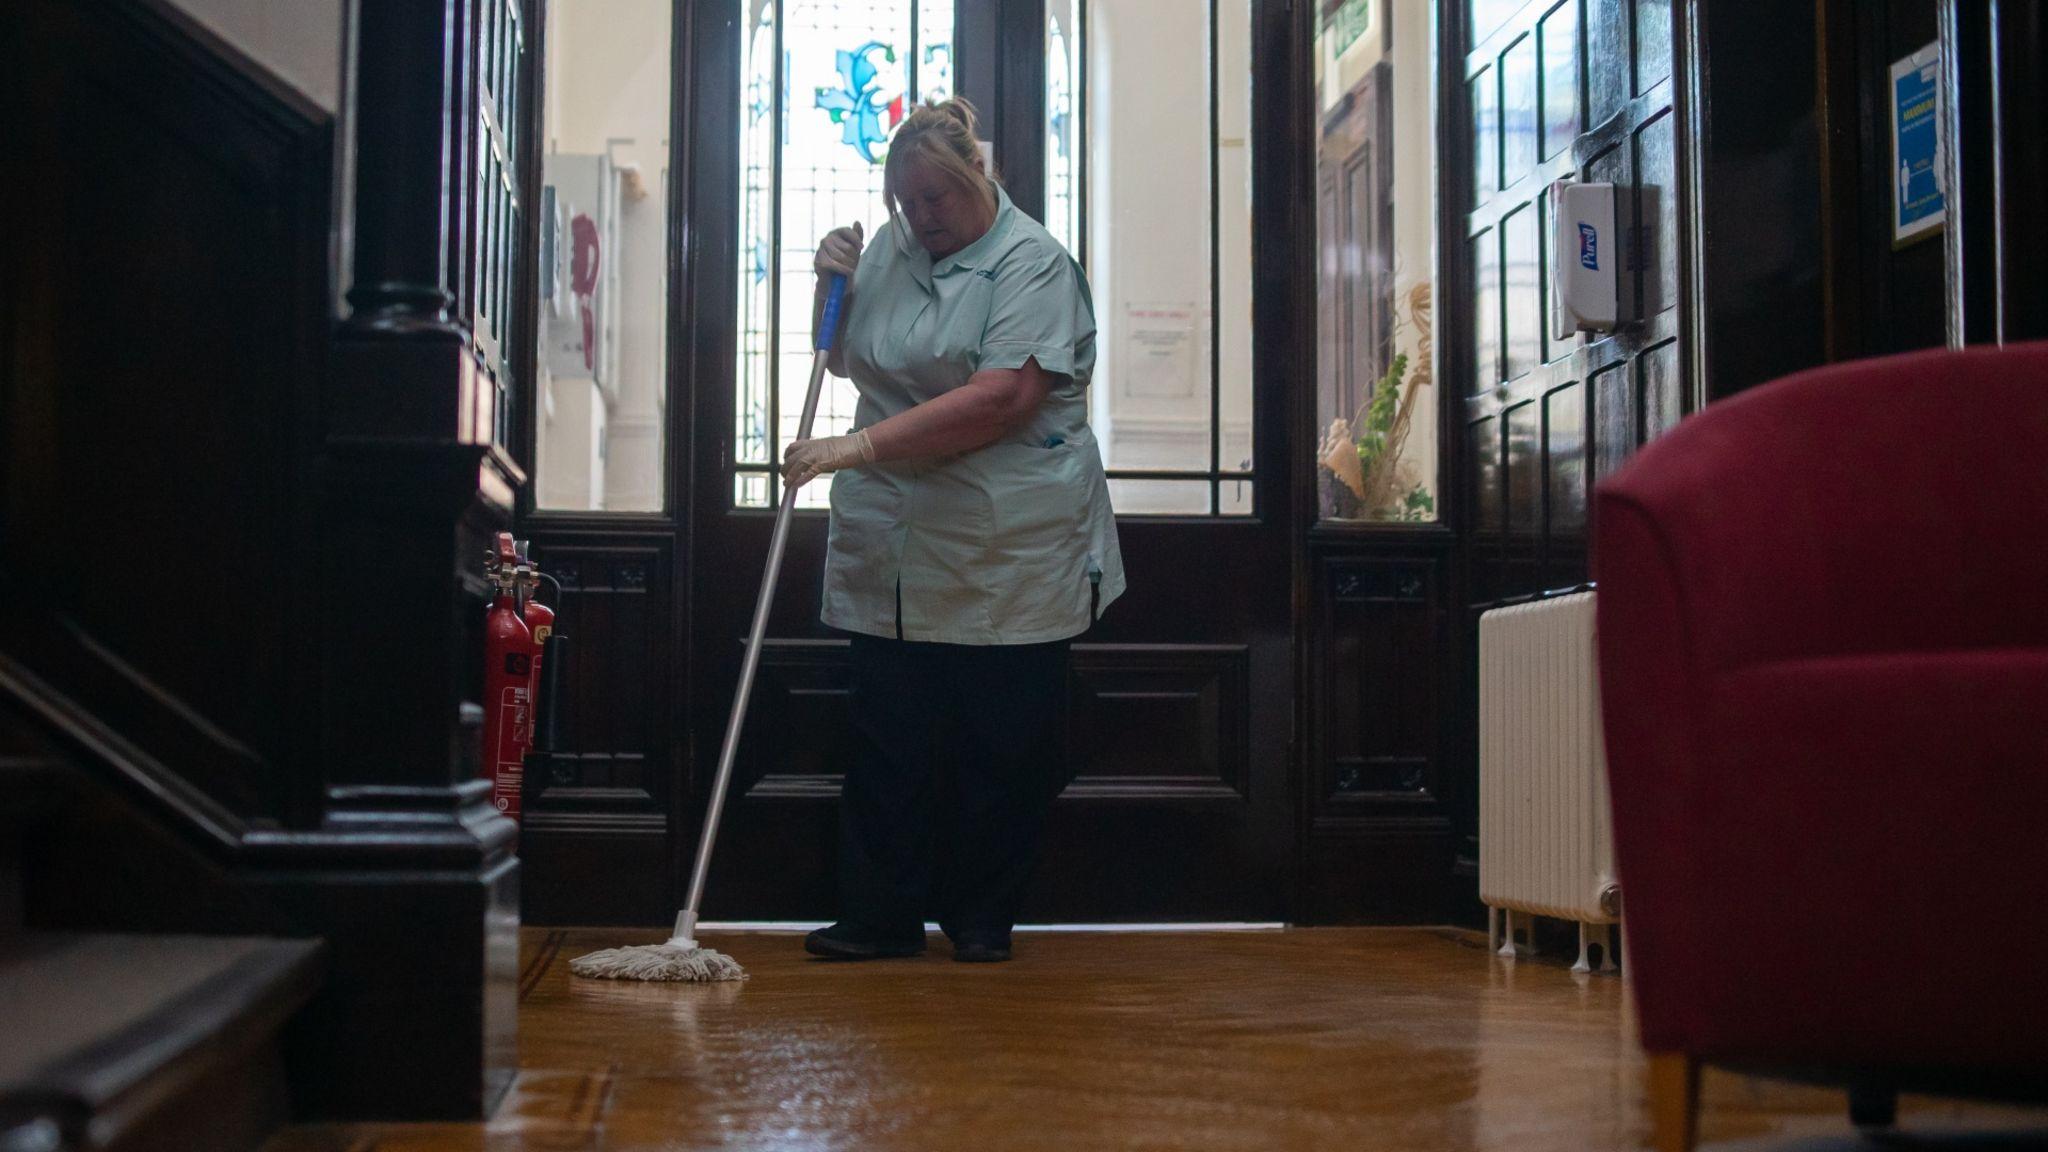 Karen cleaning